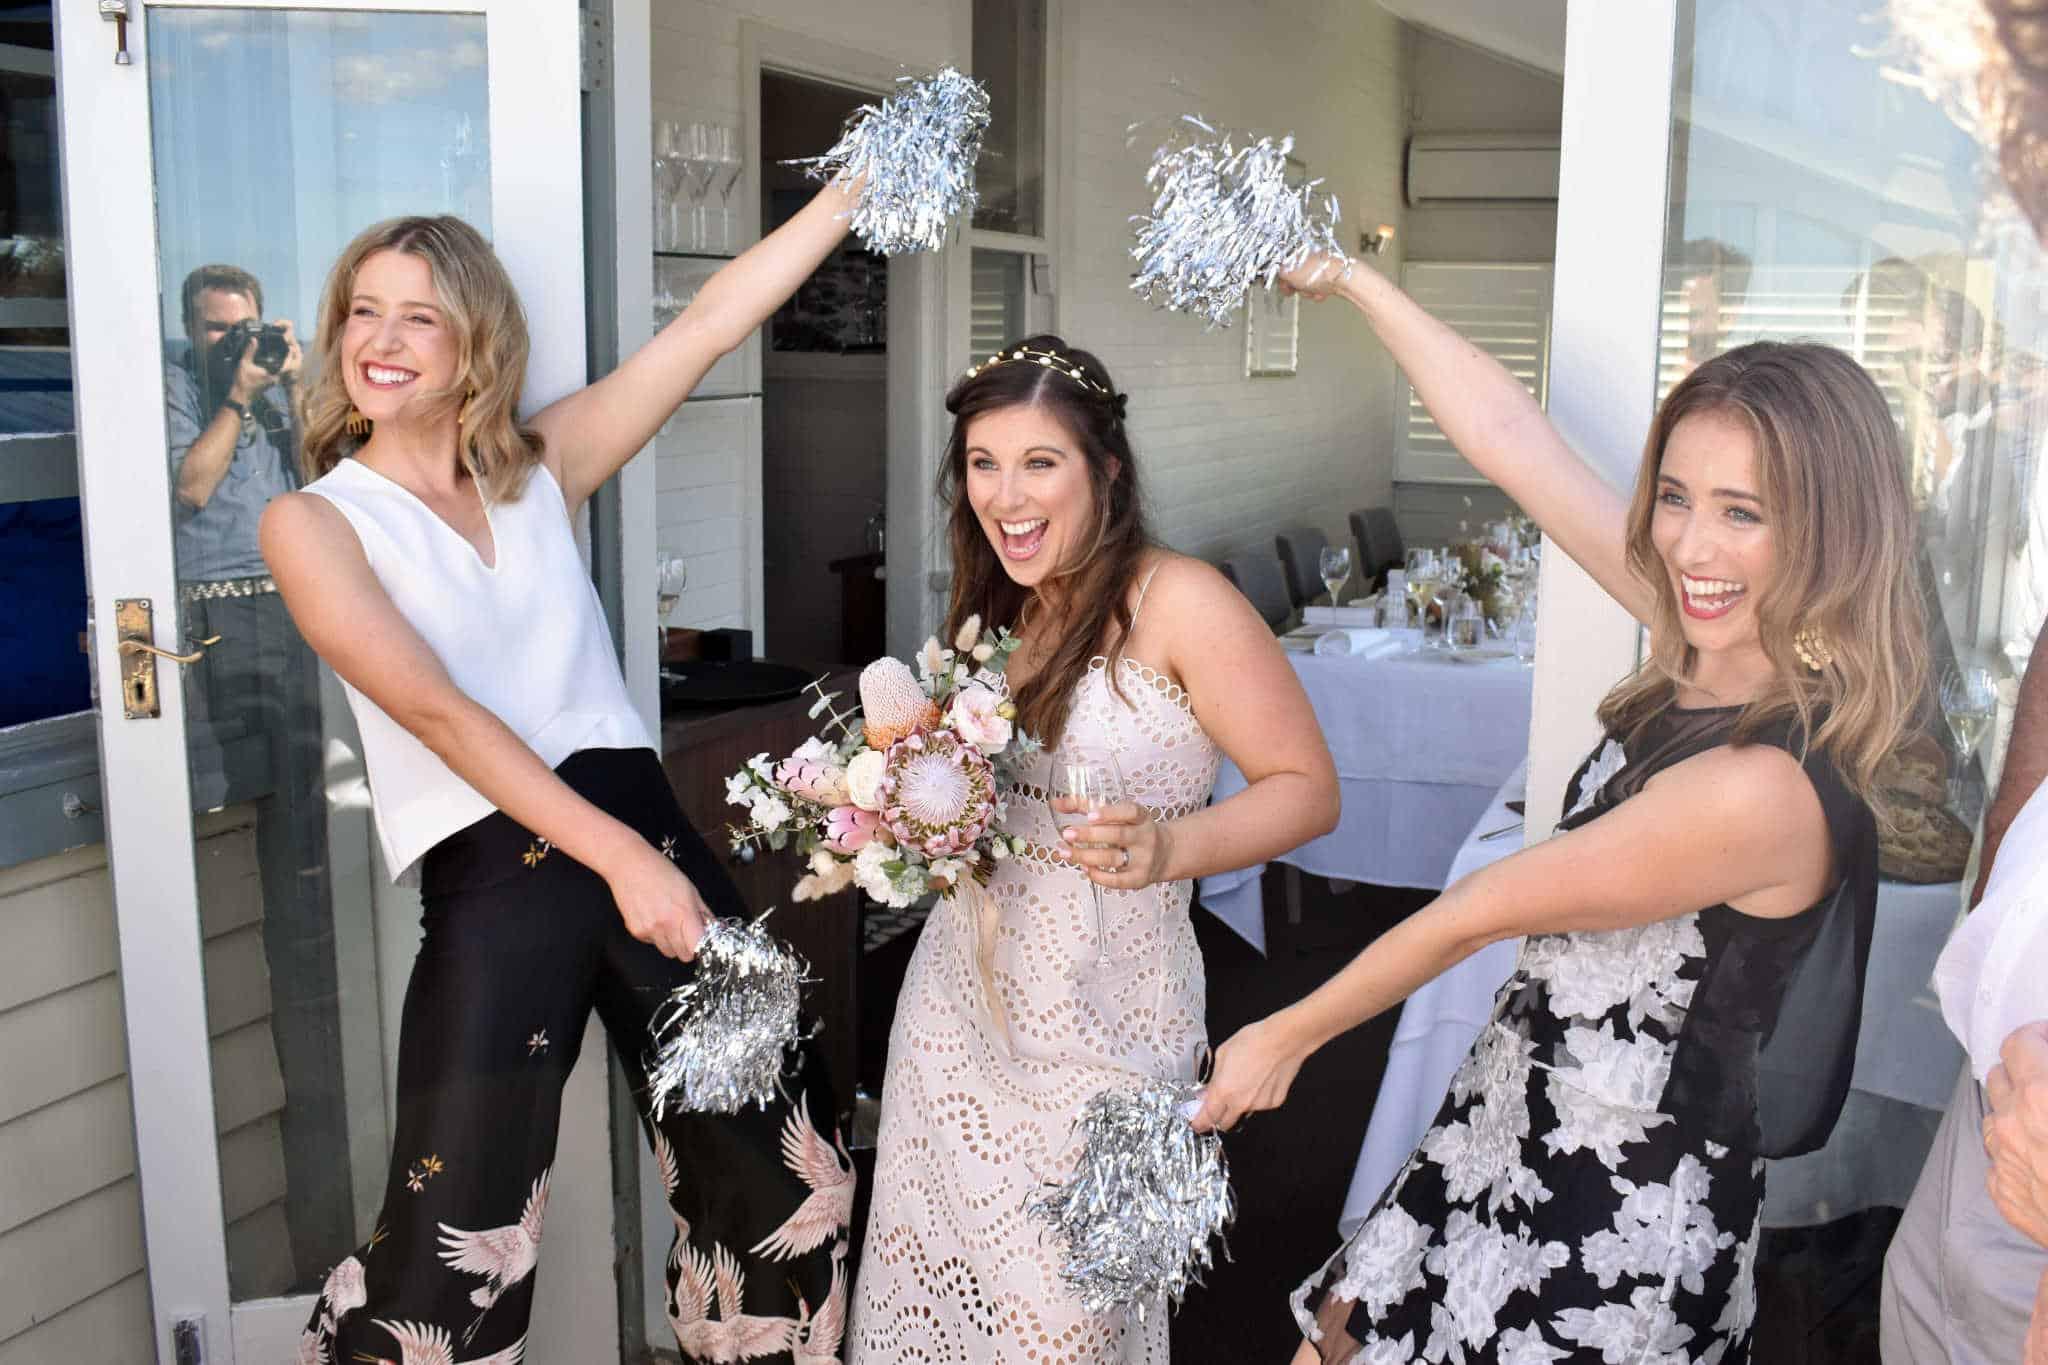 Sophie and Nat Wedding at Pilu Freshwater - Marriage Celebrant Sydney Stephen Lee